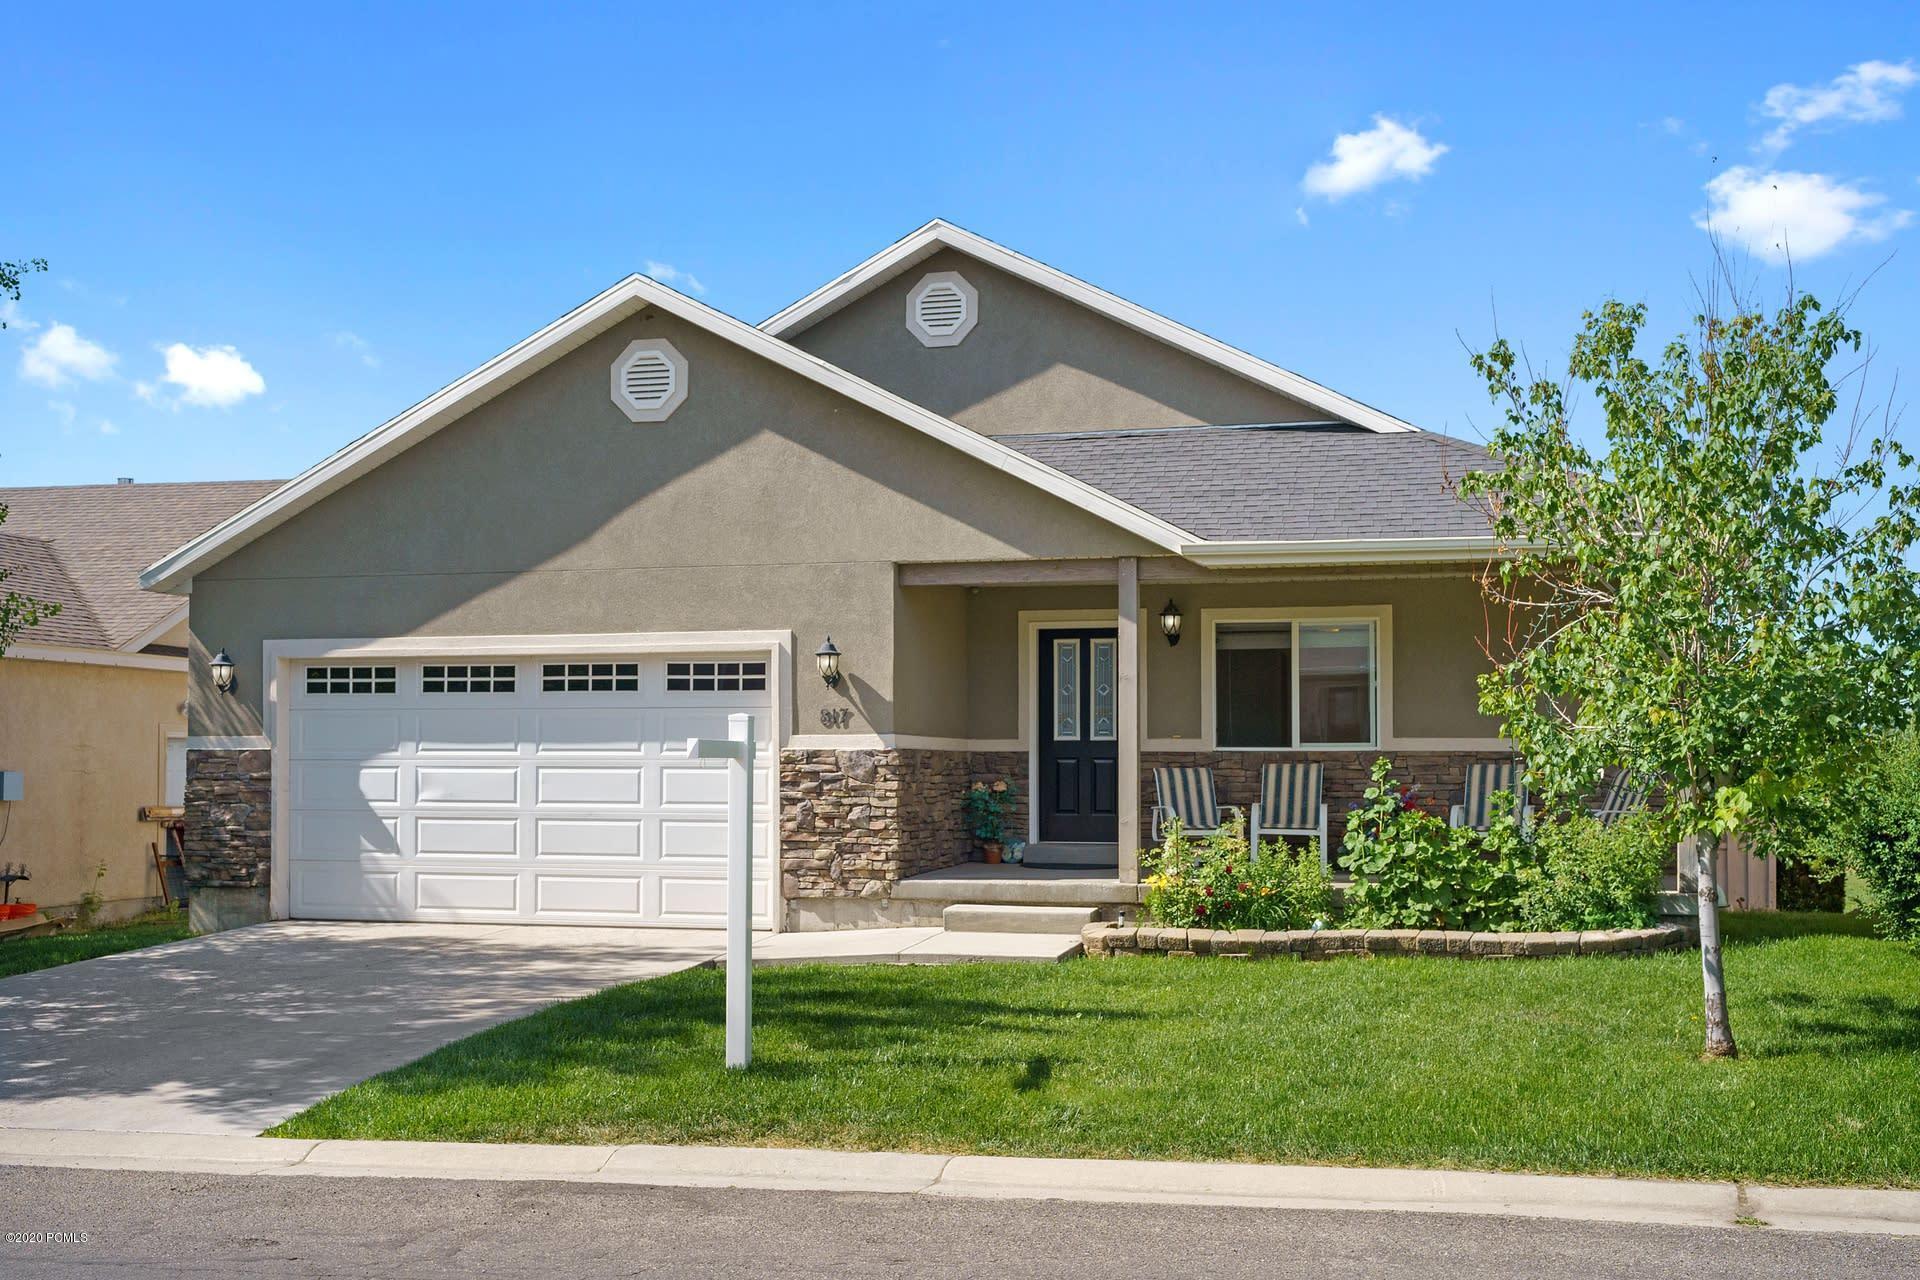 817 Saddle Drive, Oakley, Utah 84055, 3 Bedrooms Bedrooms, ,2 BathroomsBathrooms,Single Family,For Sale,Saddle,20190109112430415765000000